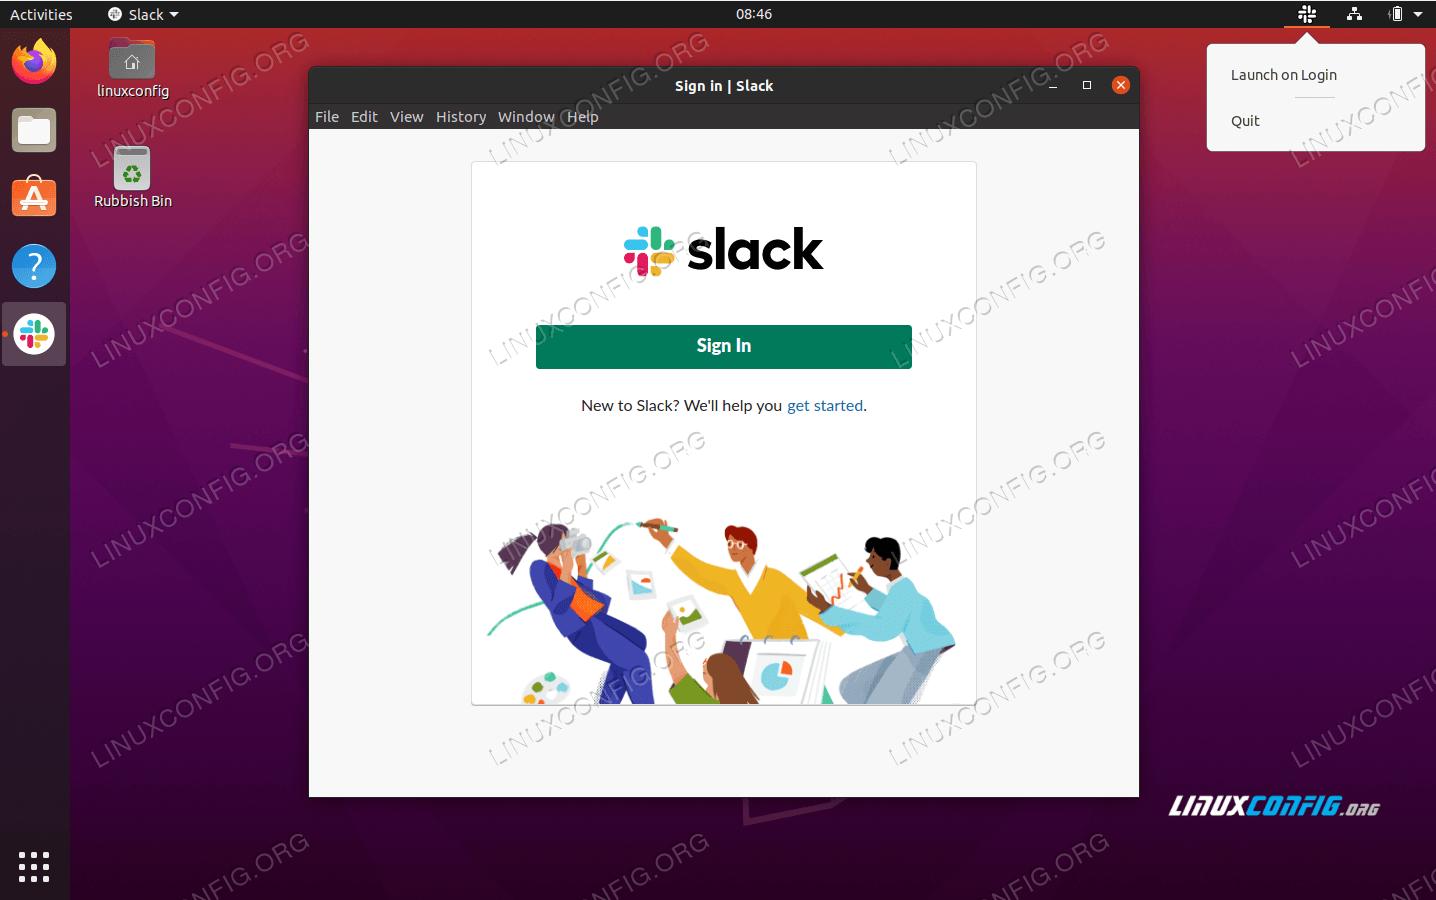 Slack instant messaging platform on Ubuntu 20.04 Focal Fossa